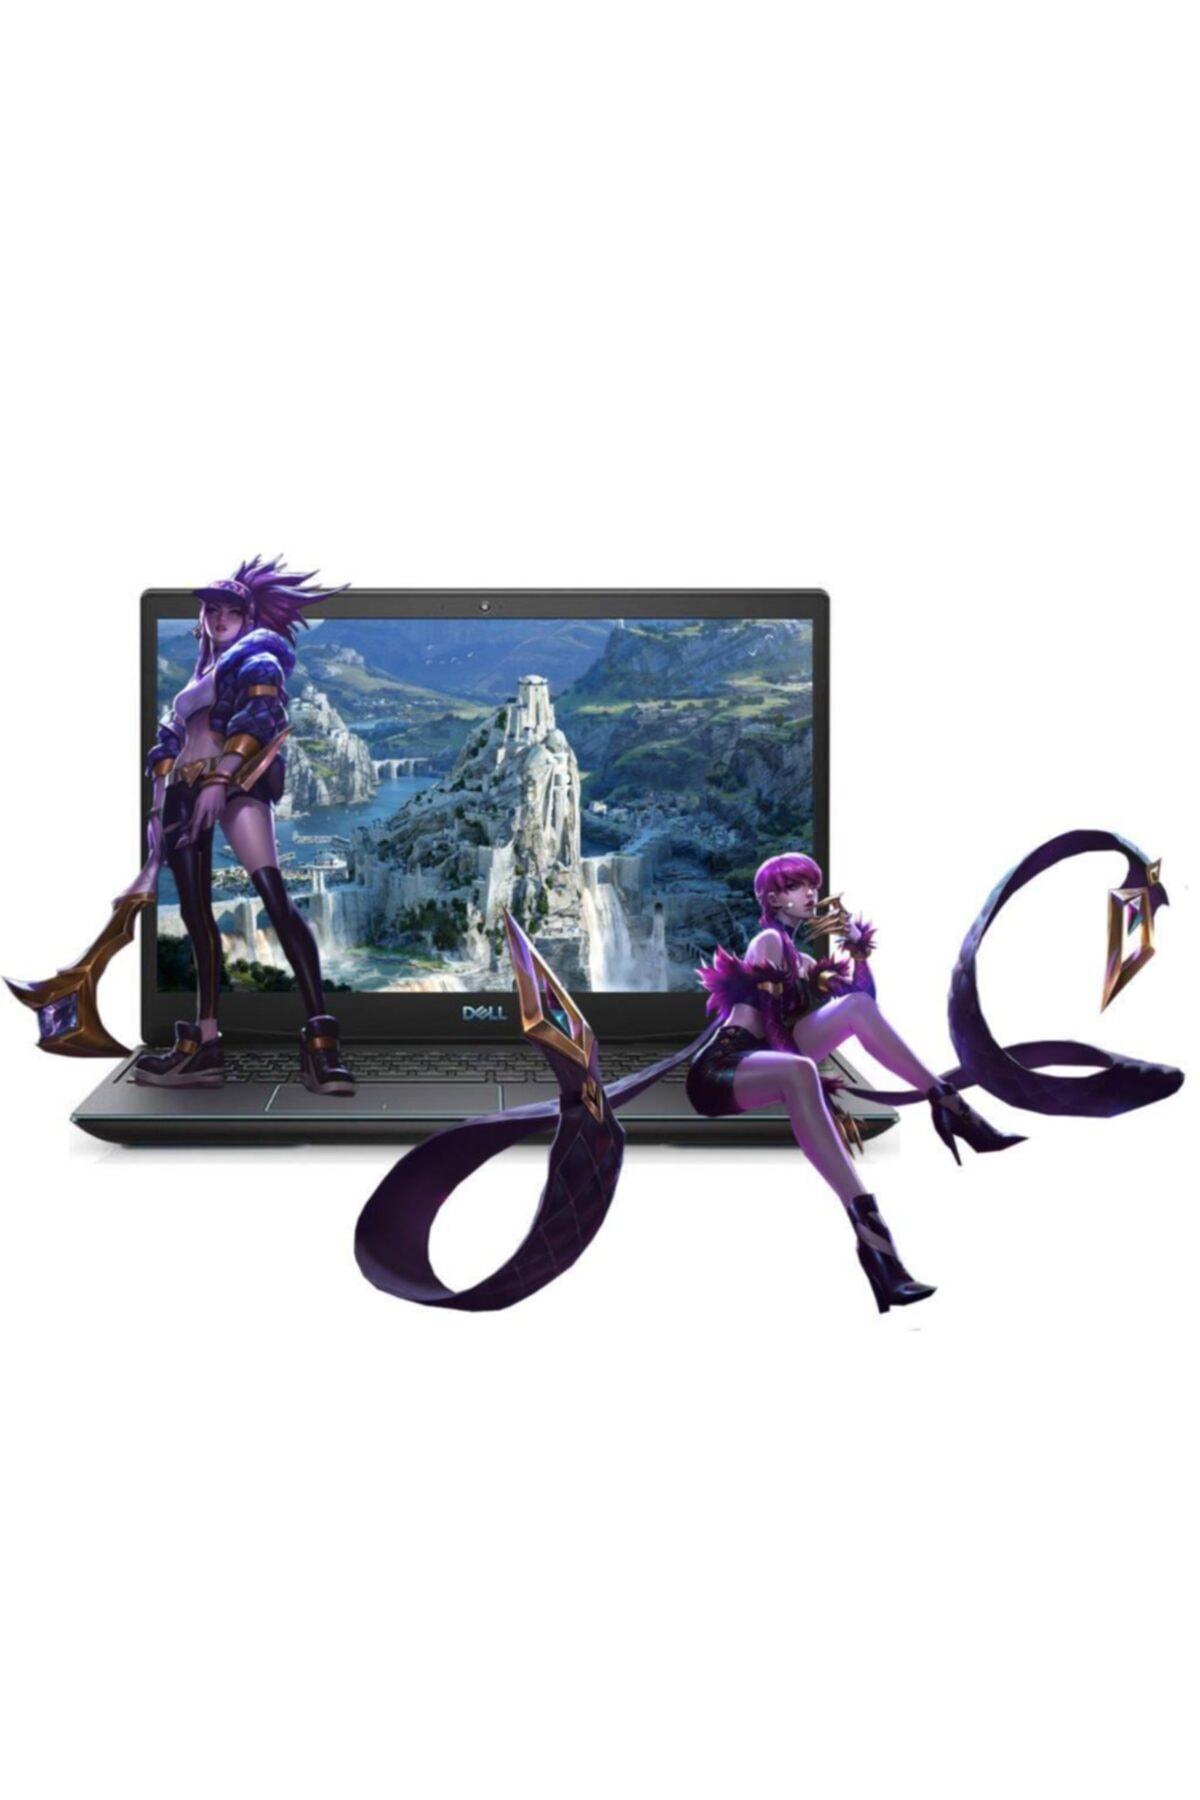 G315 4b750f161256c08 I7-10750h 32gb 1tbssd 4gb Freedos 15.6'' Fhd Taşınabilir Bilgisayar